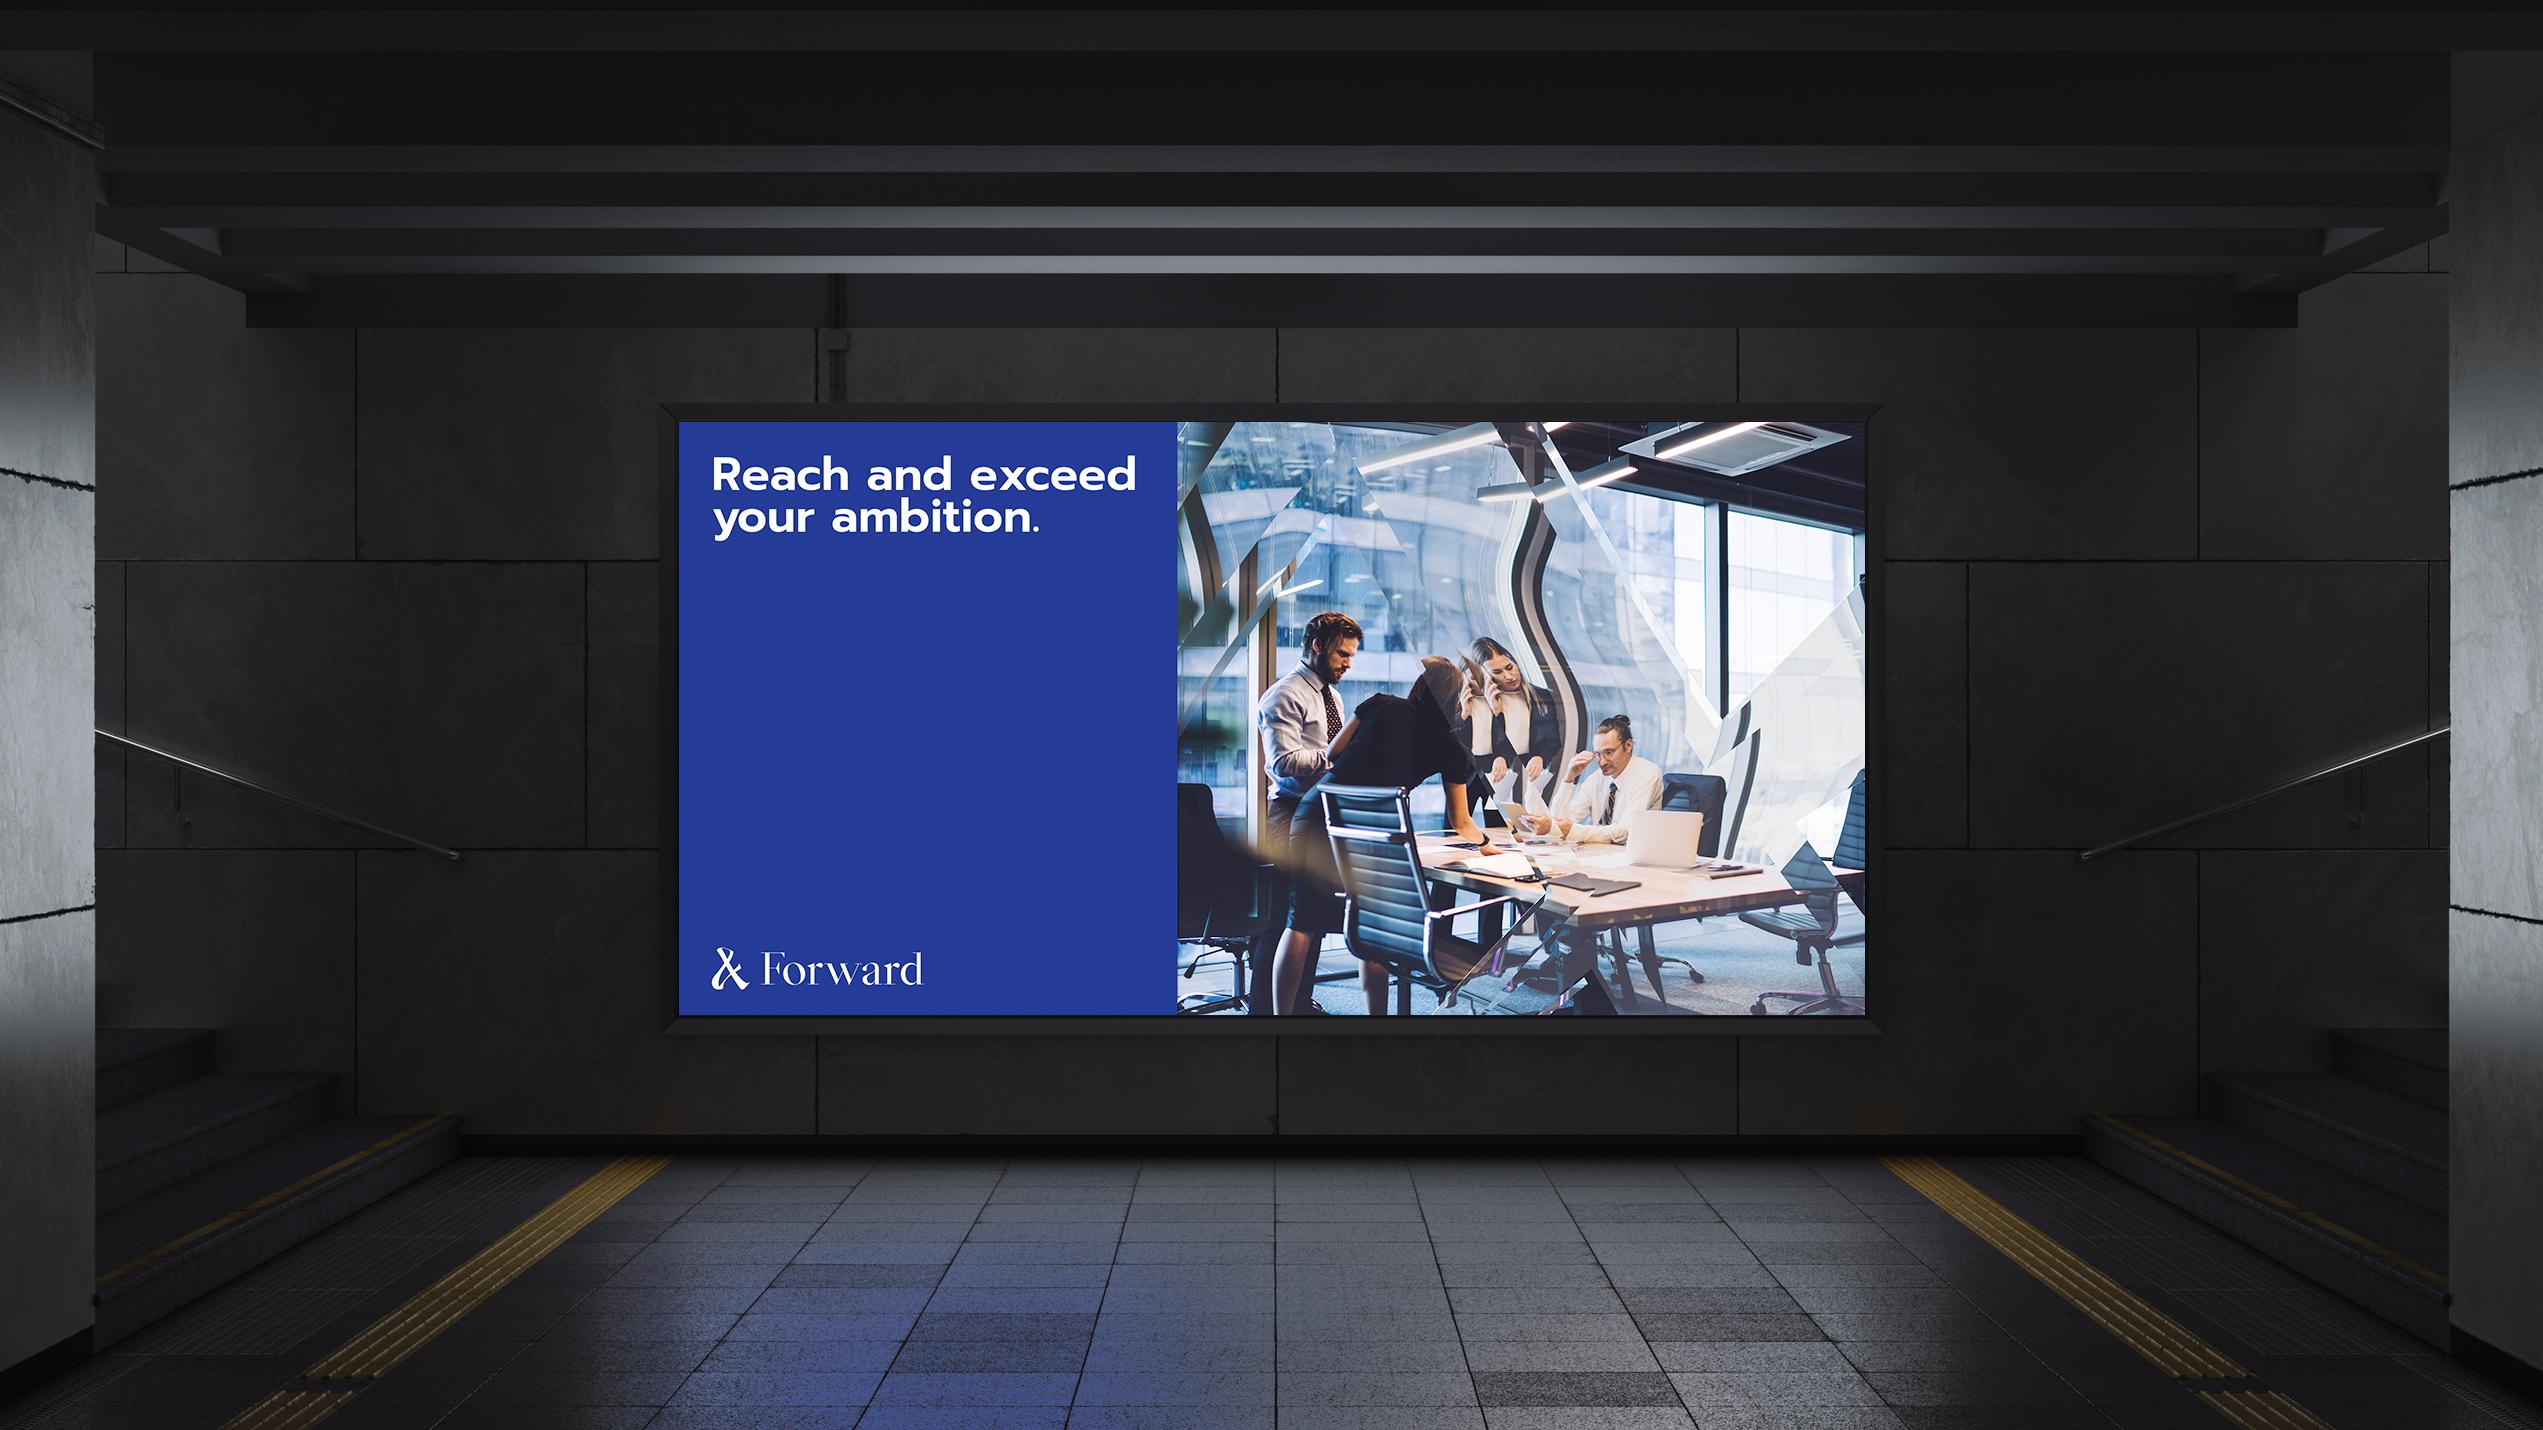 AndForward Advertising